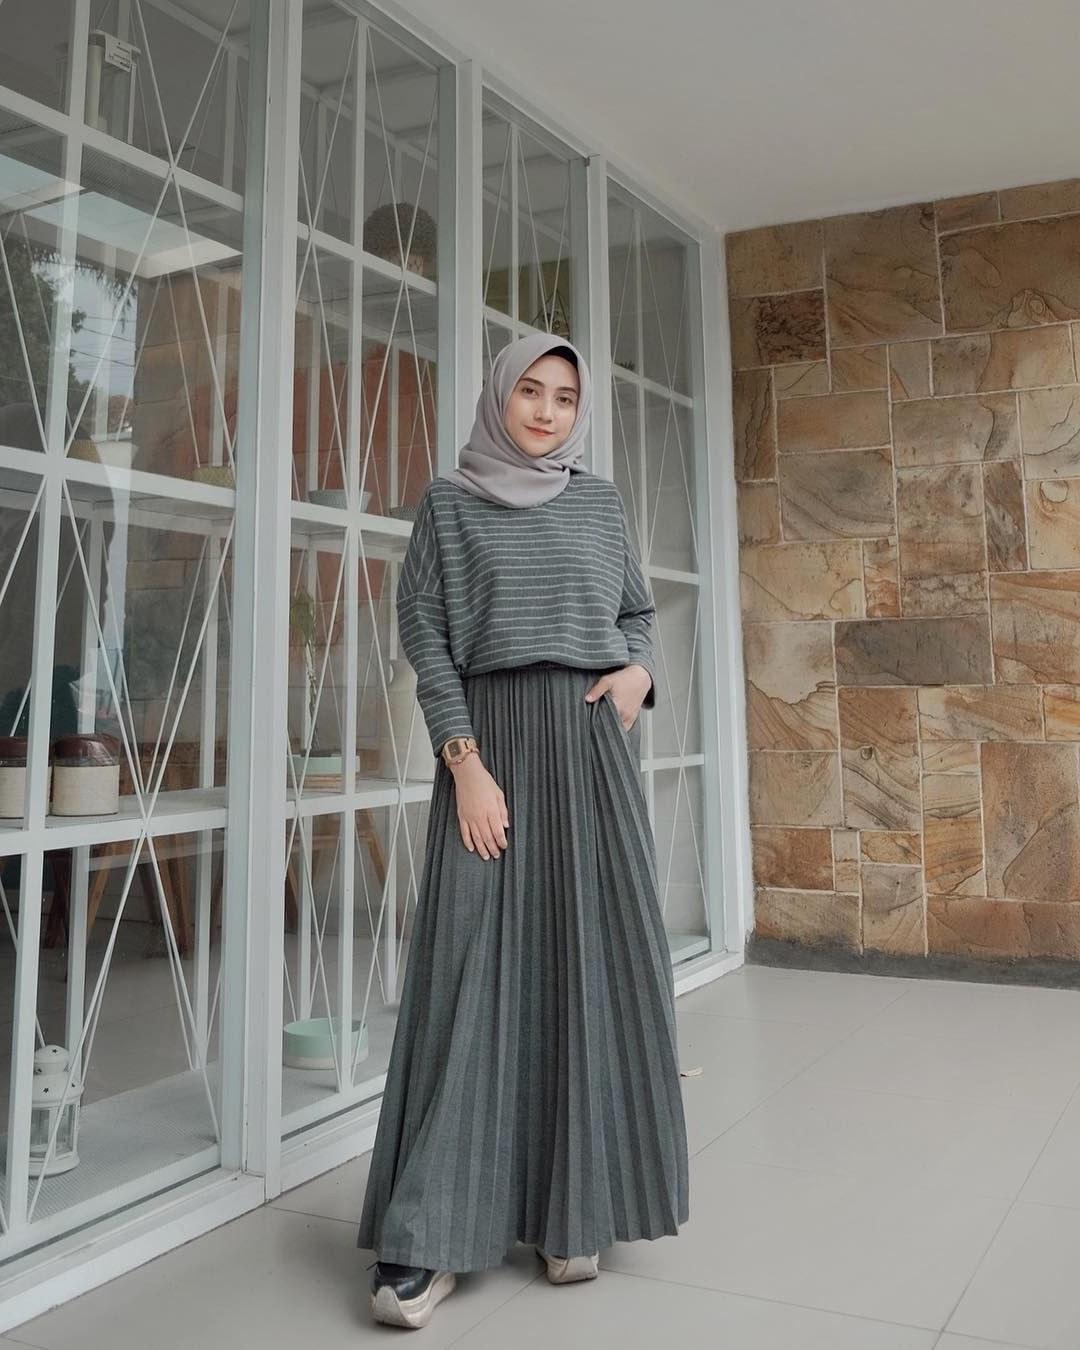 Design Model Baju Lebaran Terbaru 2019 X8d1 Baju Muslim Lebaran Terbaru 2019 Dengan Gambar